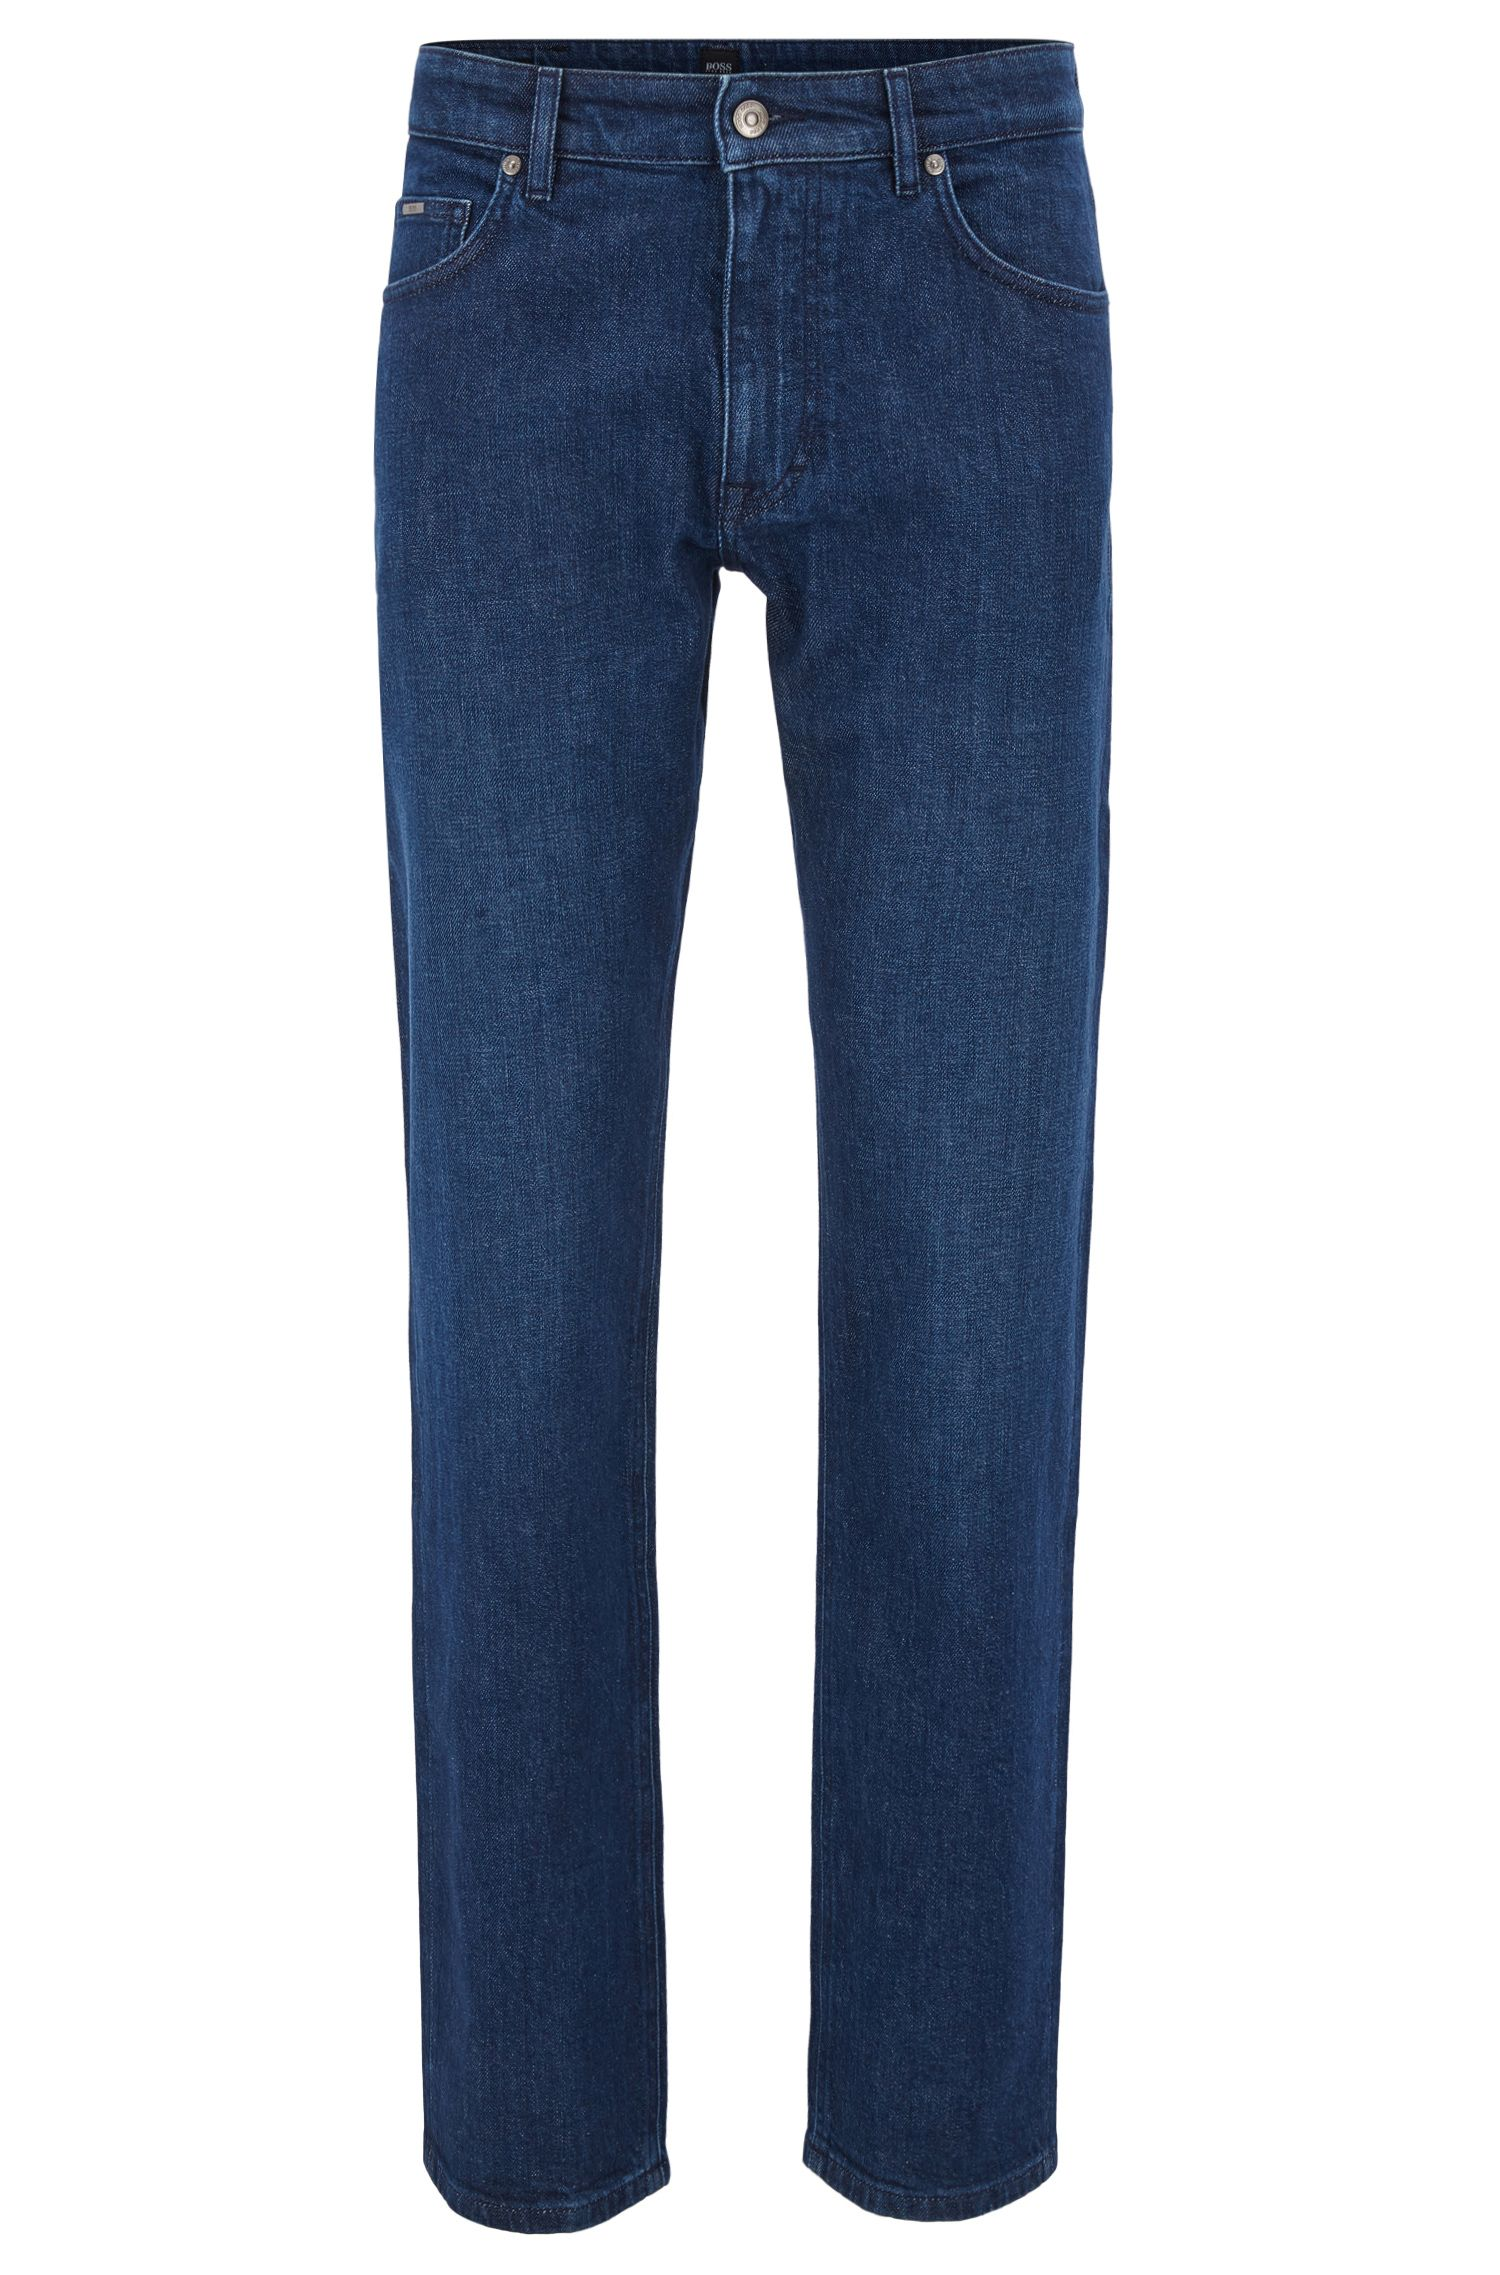 Relaxed-fit jeans in dark-blue Italian denim